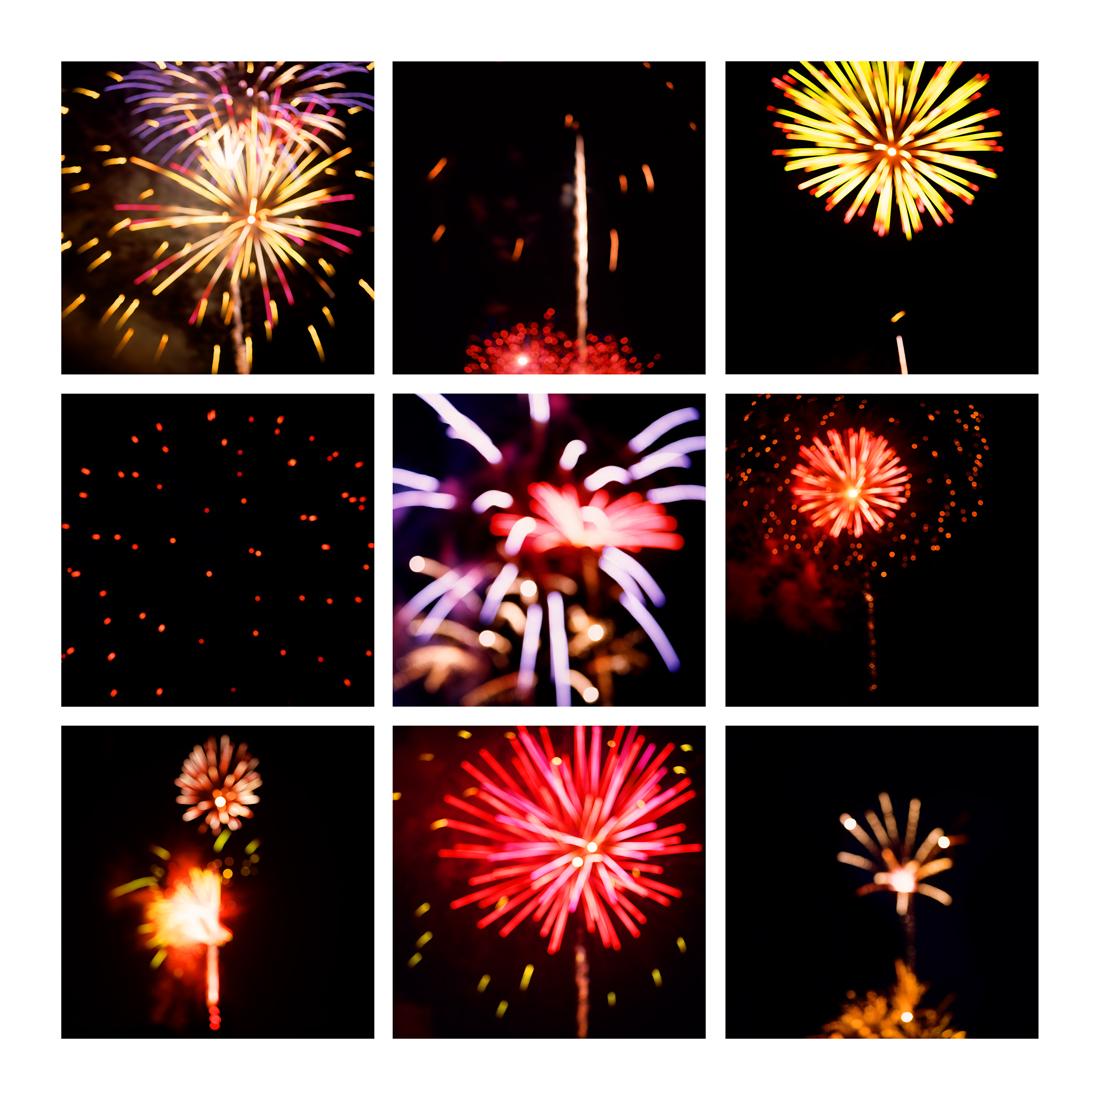 Fireworks #5, 2019 (2008-2019)